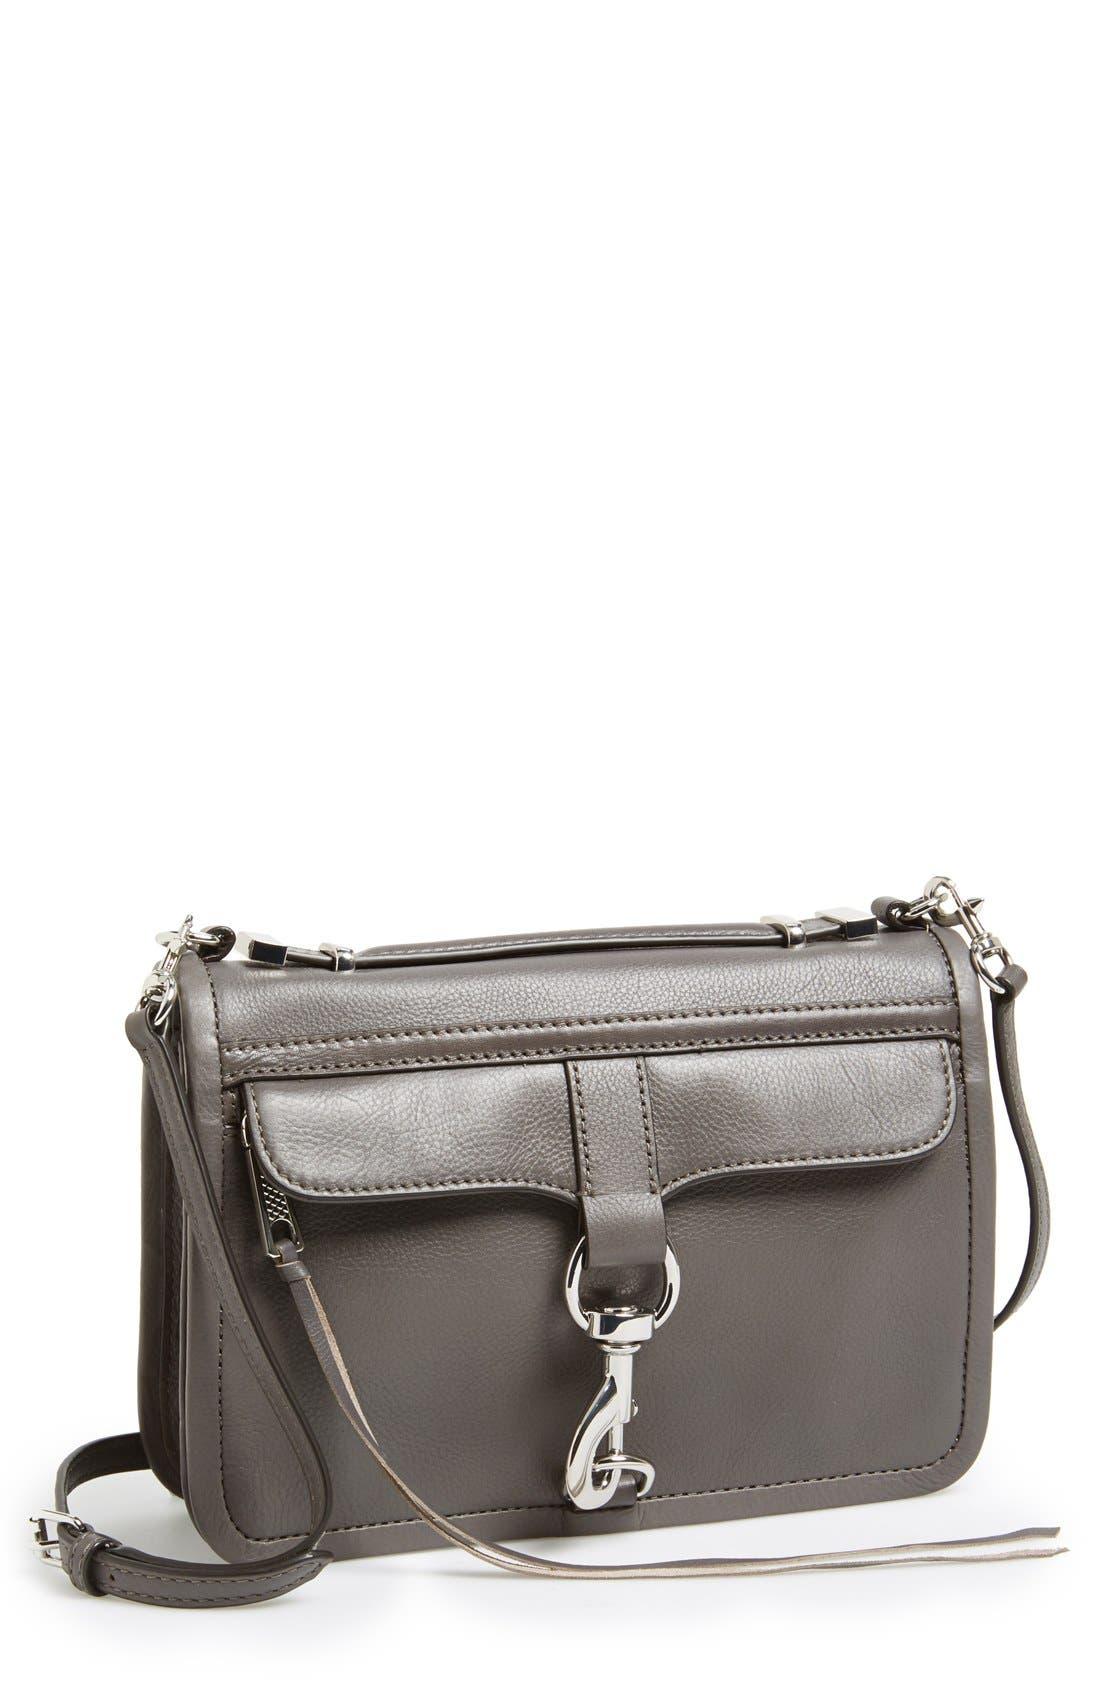 Alternate Image 1 Selected - Rebecca Minkoff 'Bowery' Convertible Crossbody Bag